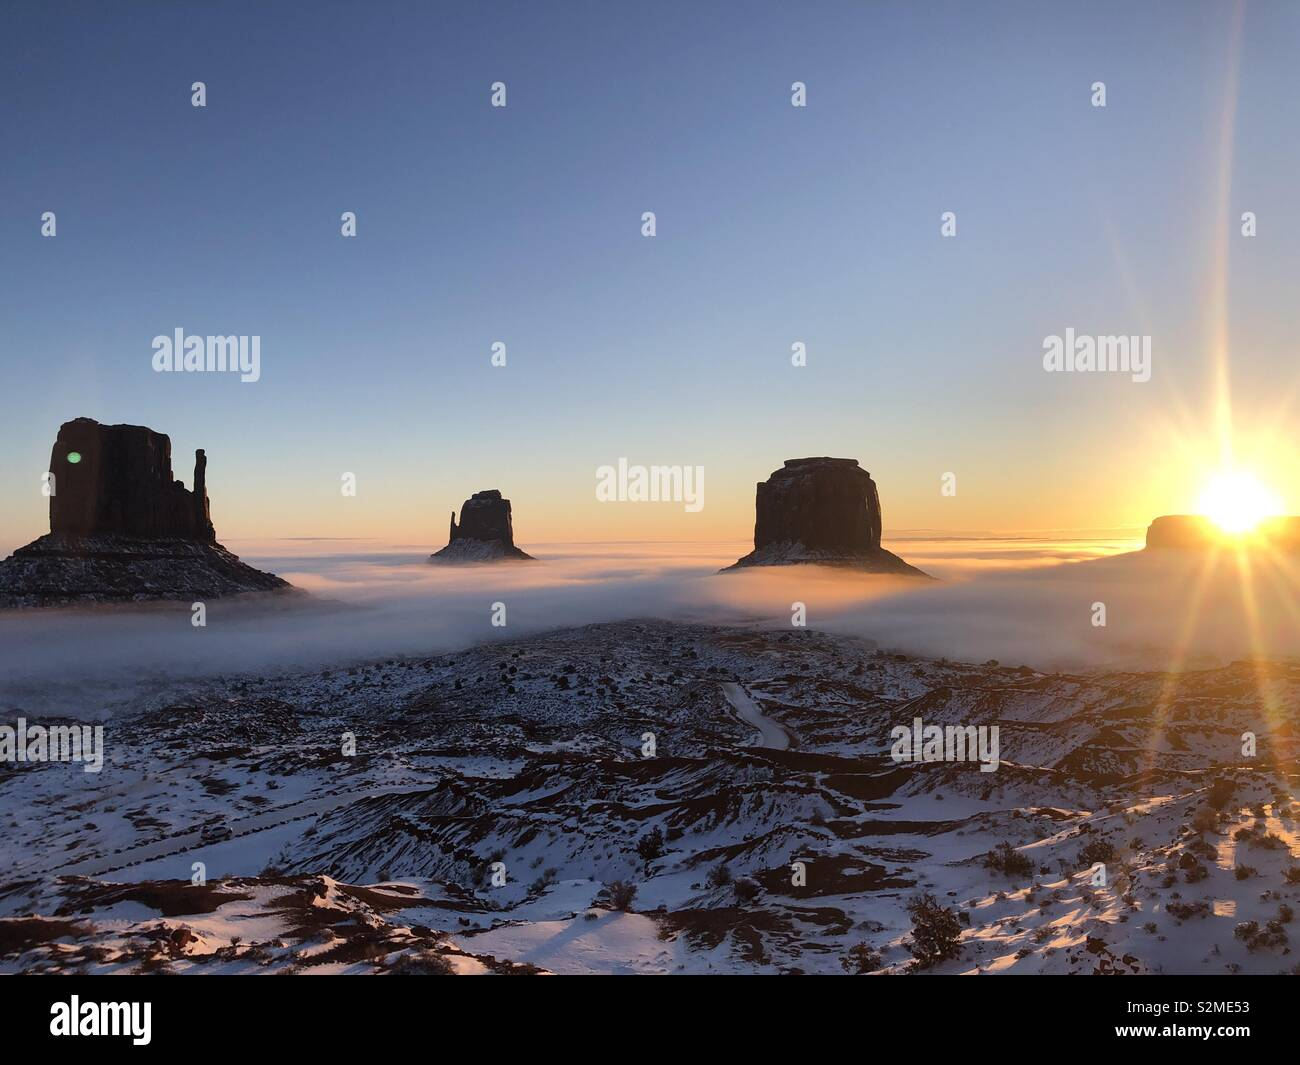 Amanecer Monument Valley Utah Foto de stock